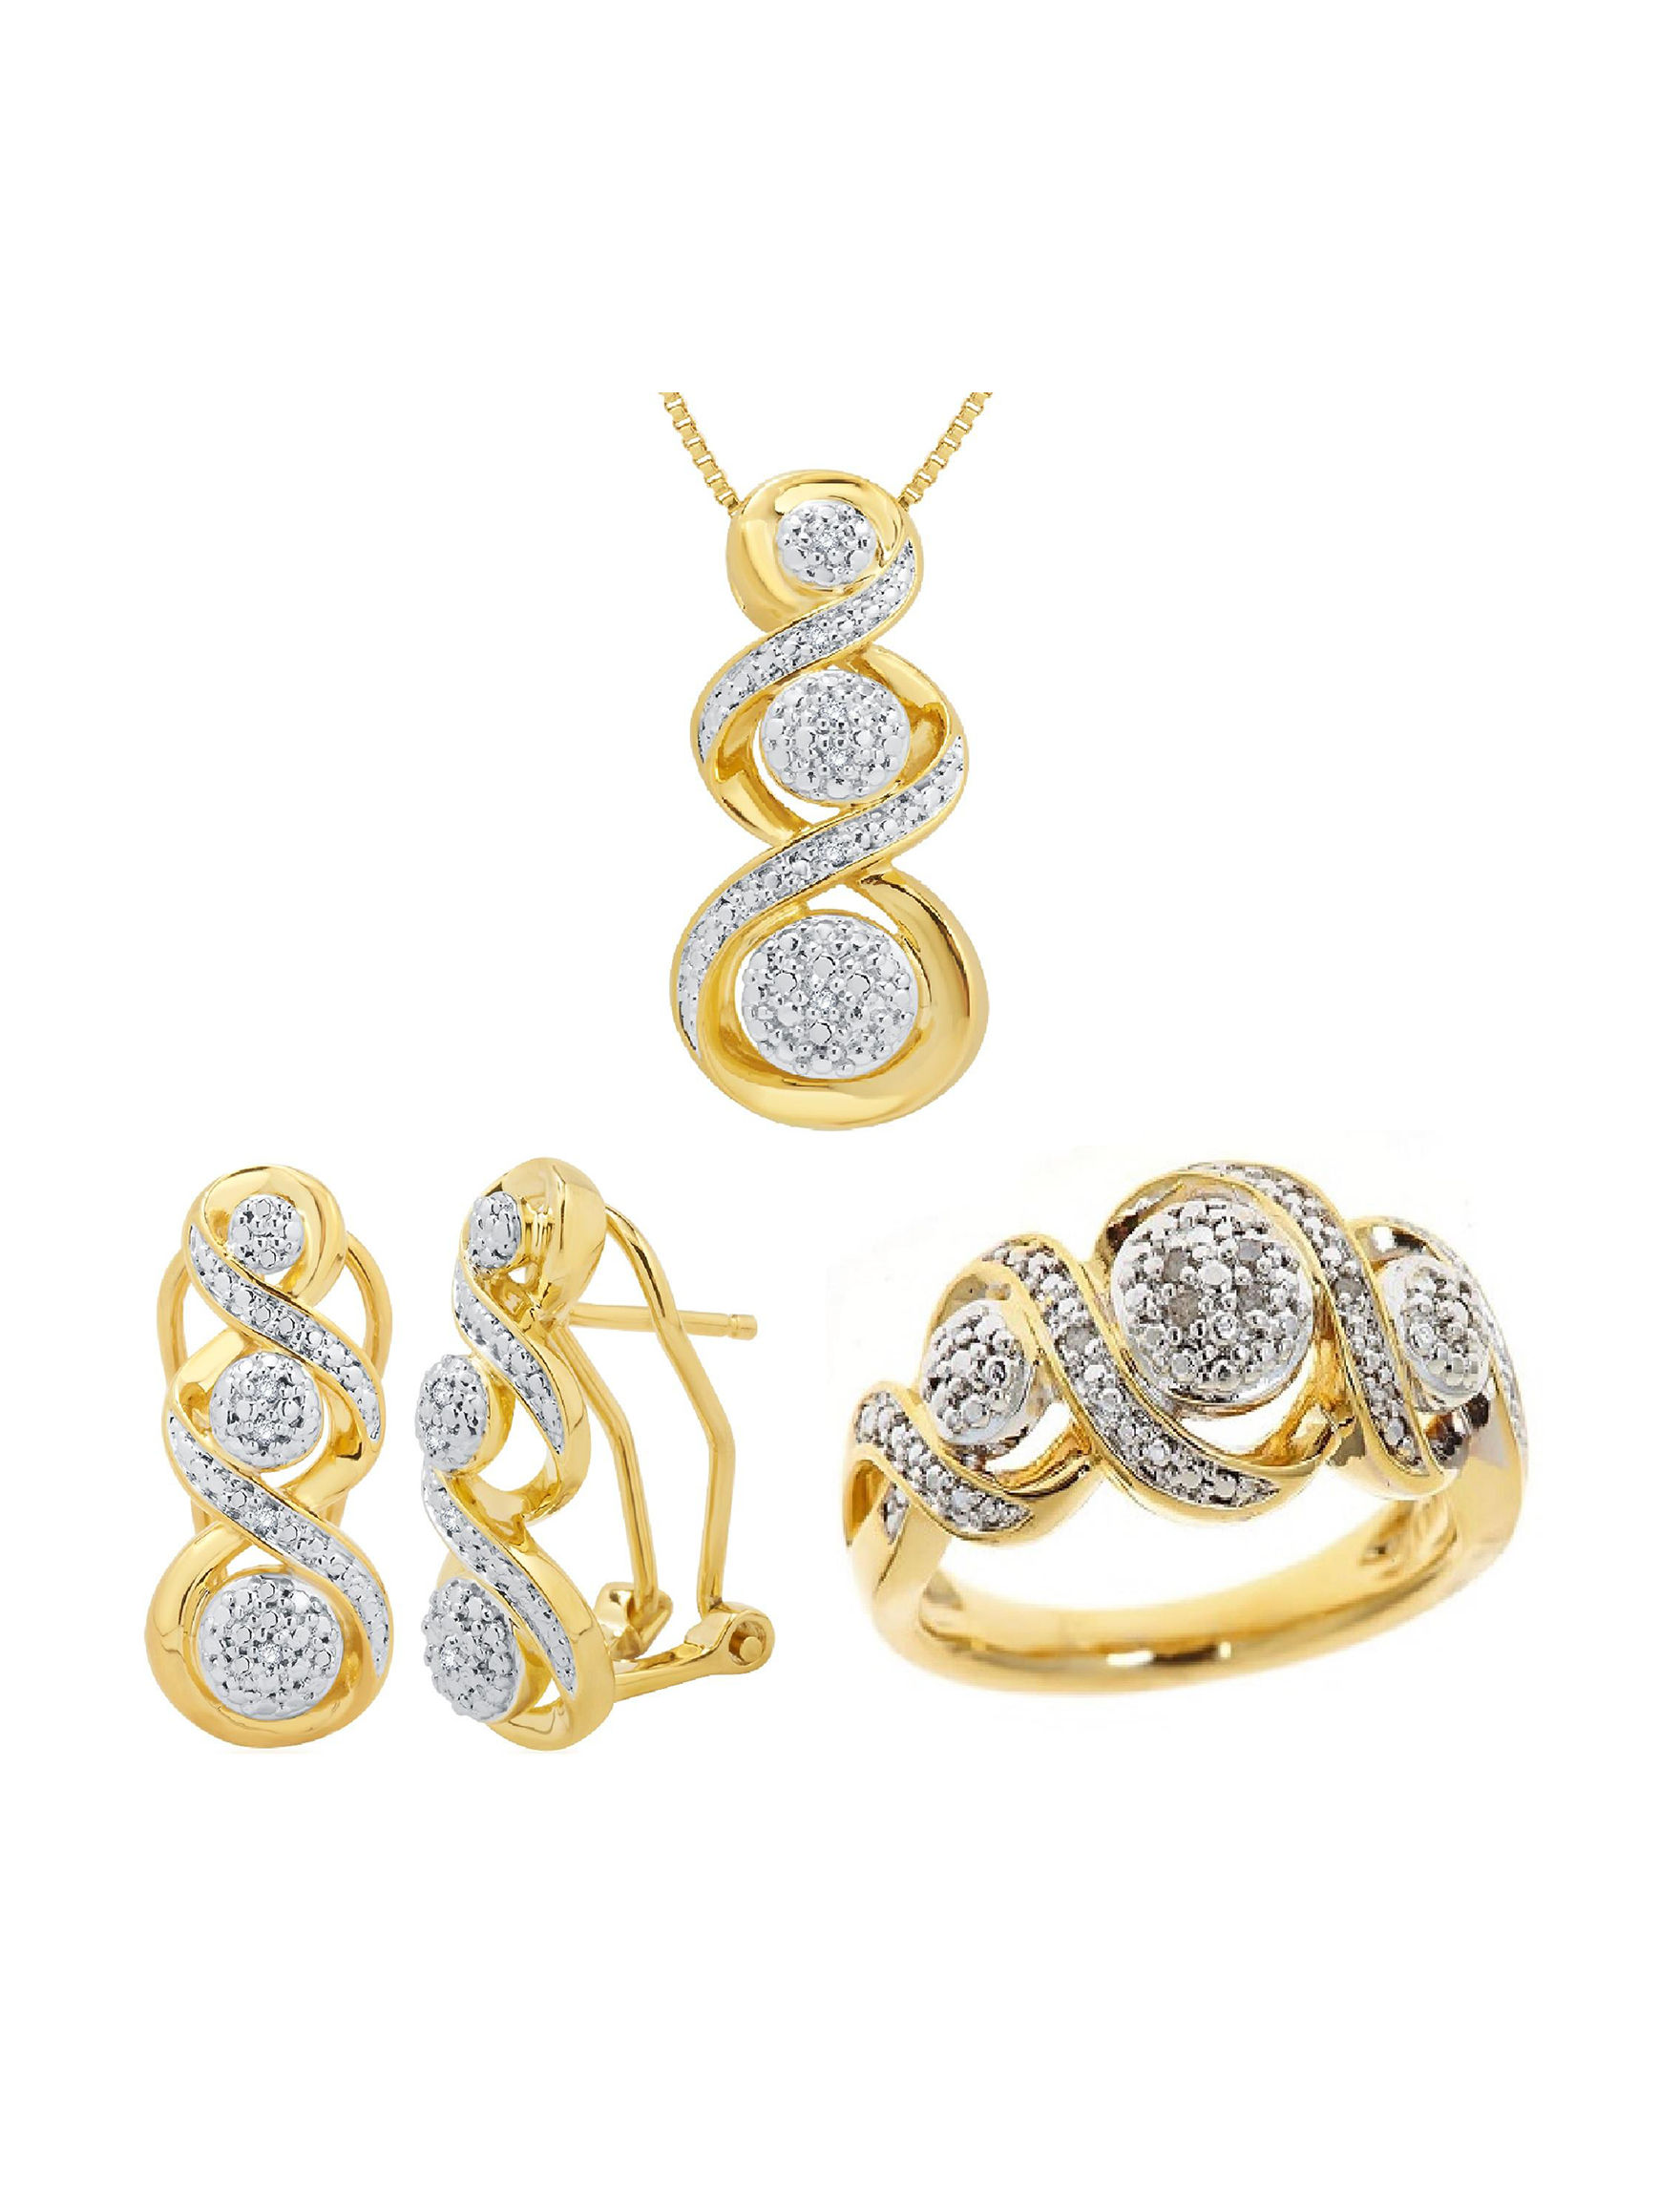 Kiran 3-pc. 1/10 CT.T.W. Diamond Jewelry Set | Stage Stores